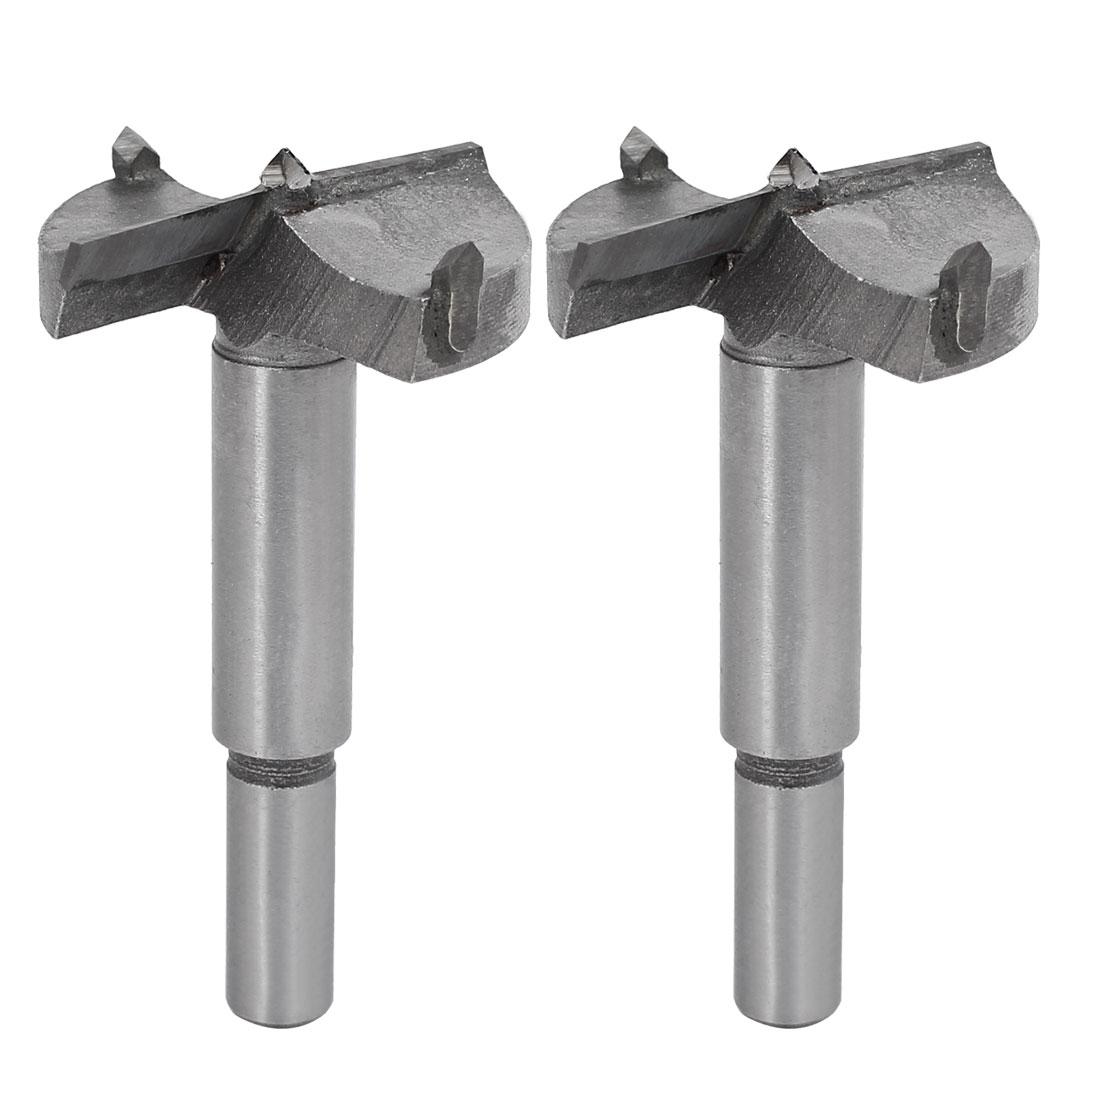 42mm Dia Carbide Tip Round Shank Wood Cutting Hole Saw Hinge Boring Bit 2pcs